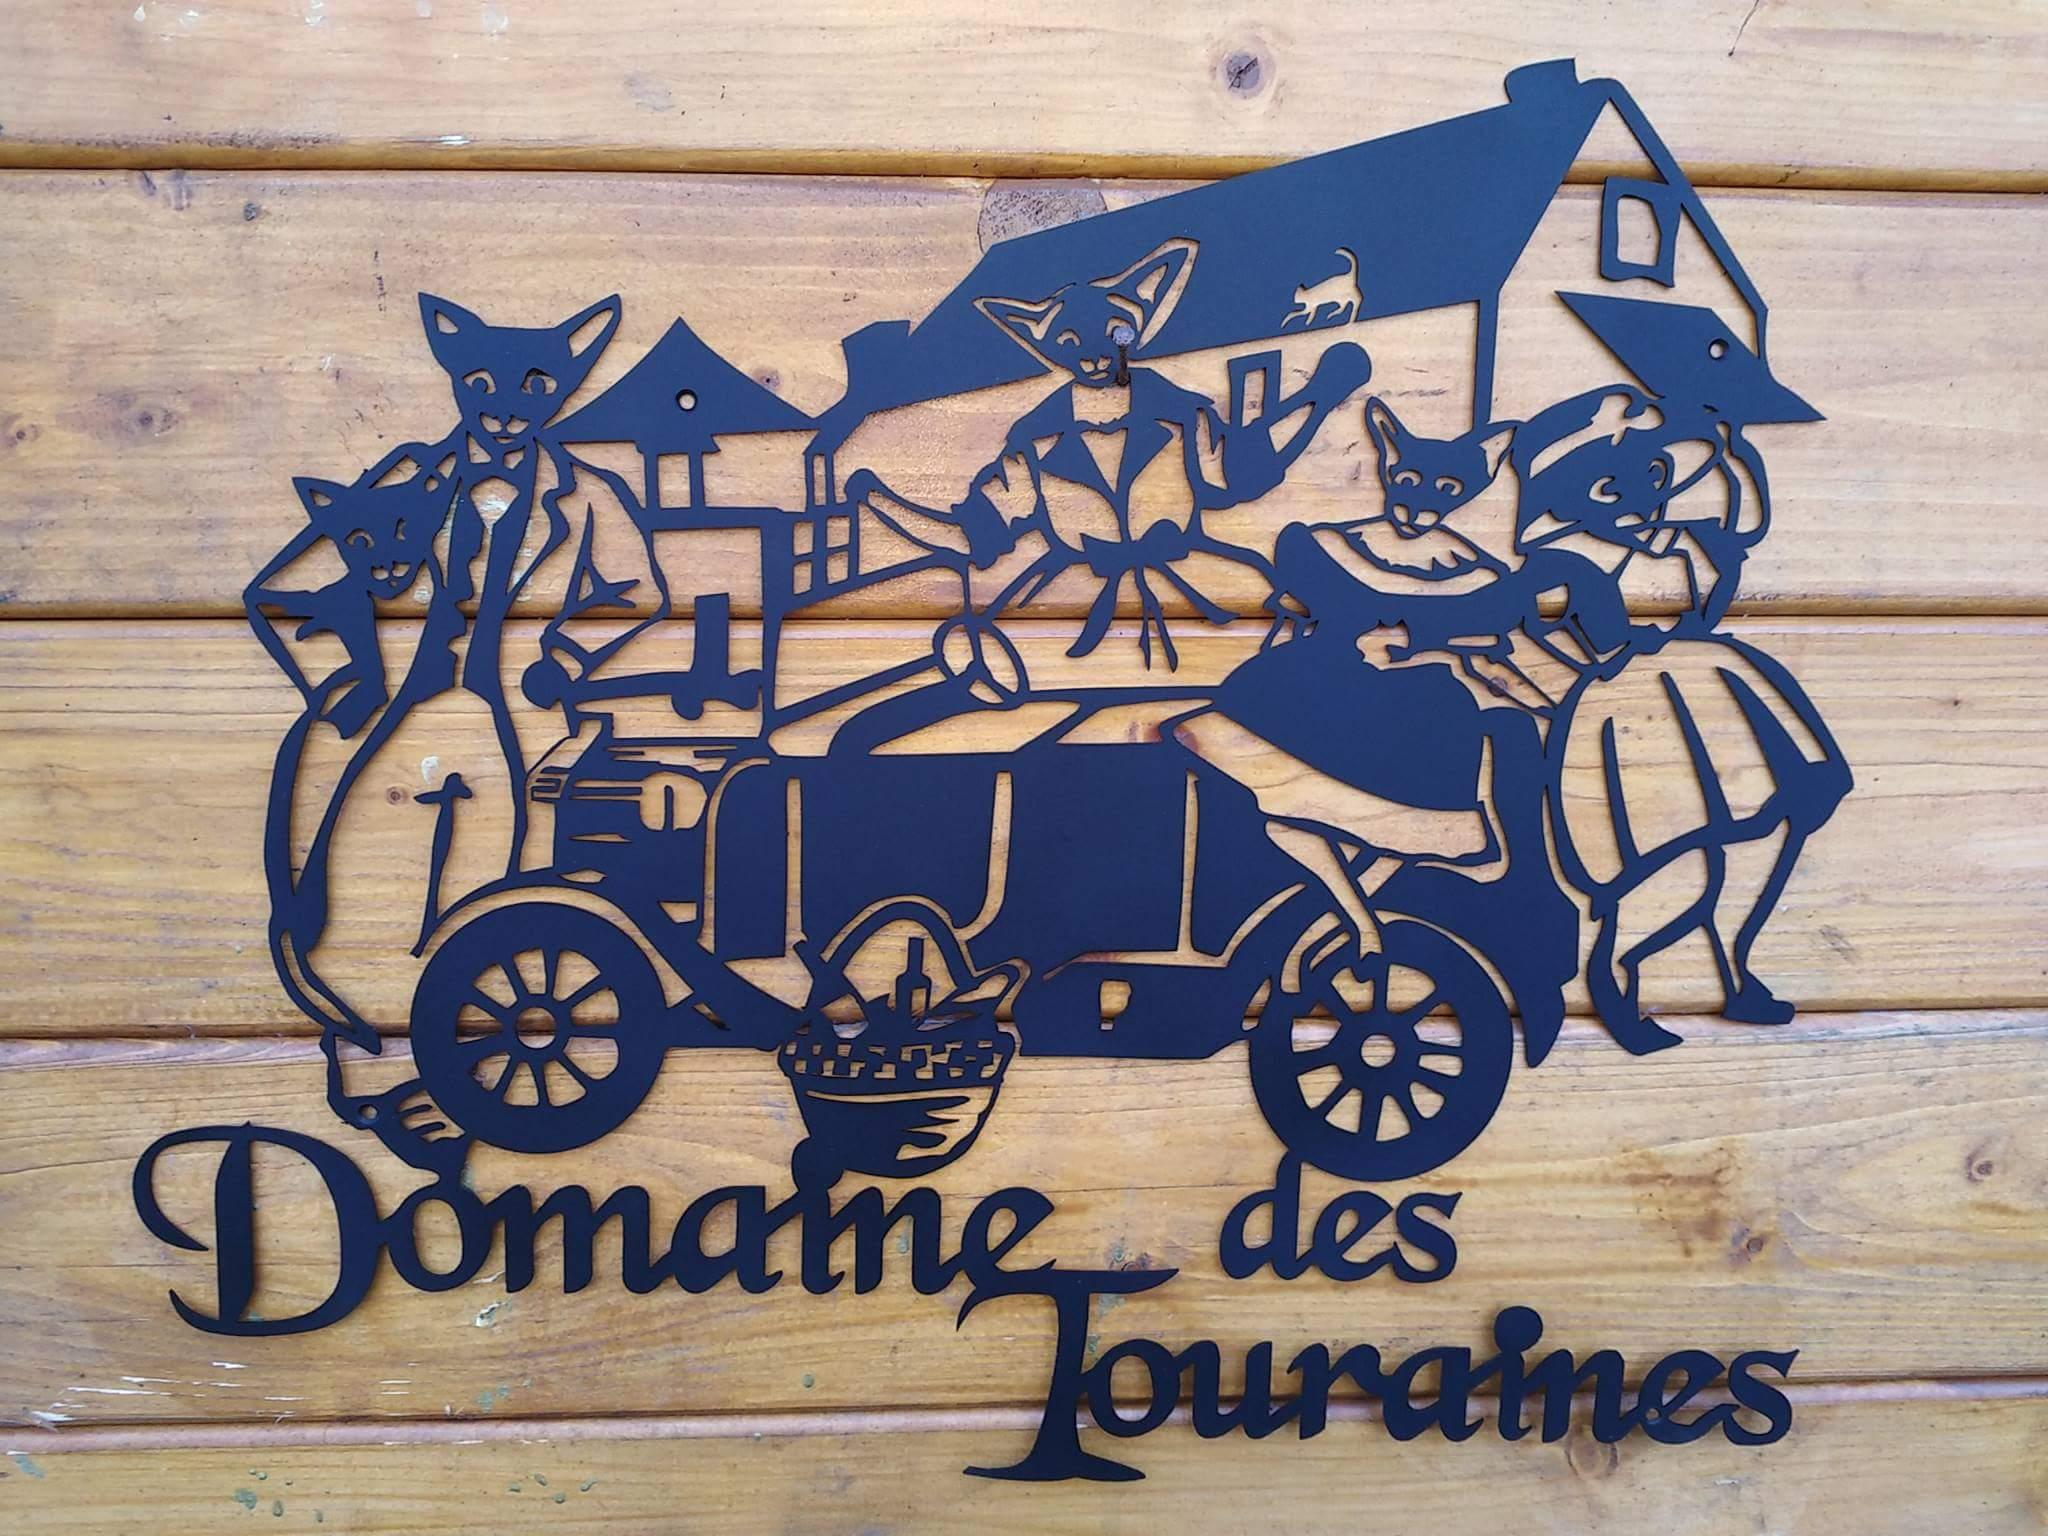 Domaine des Touraines